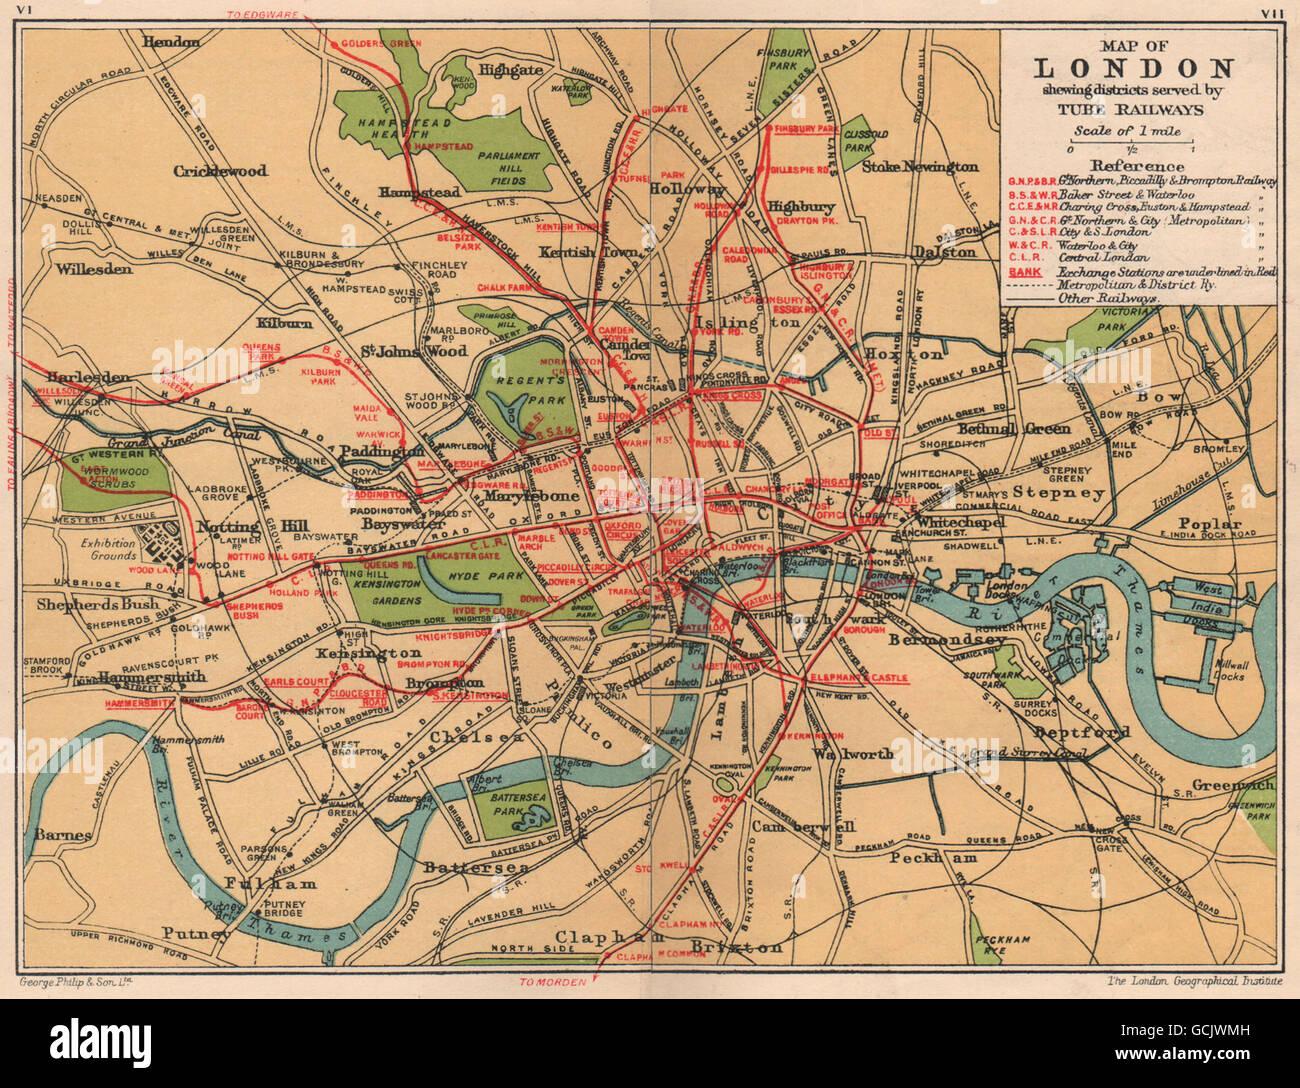 London Underground Rail Map.London Underground Vintage Tube Railway Map W Original Line